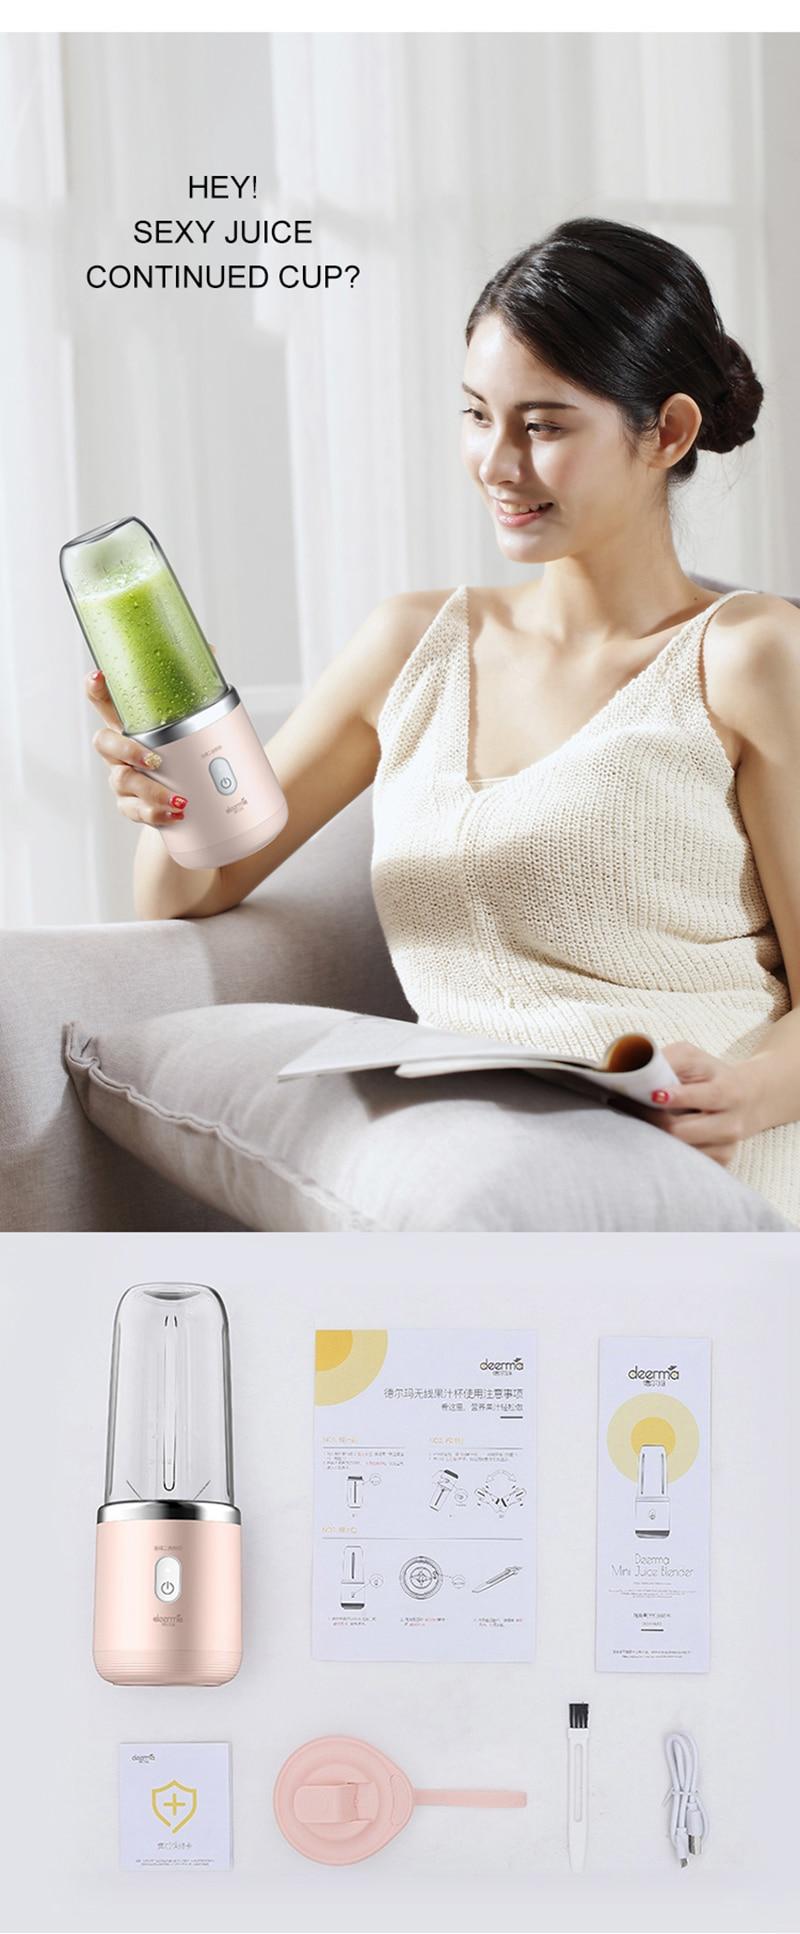 Deerma Portable Blender Electric Juicer 400ML Automatic Multipurpose USB Rechargable Mini Juice Cup Cut Mixer